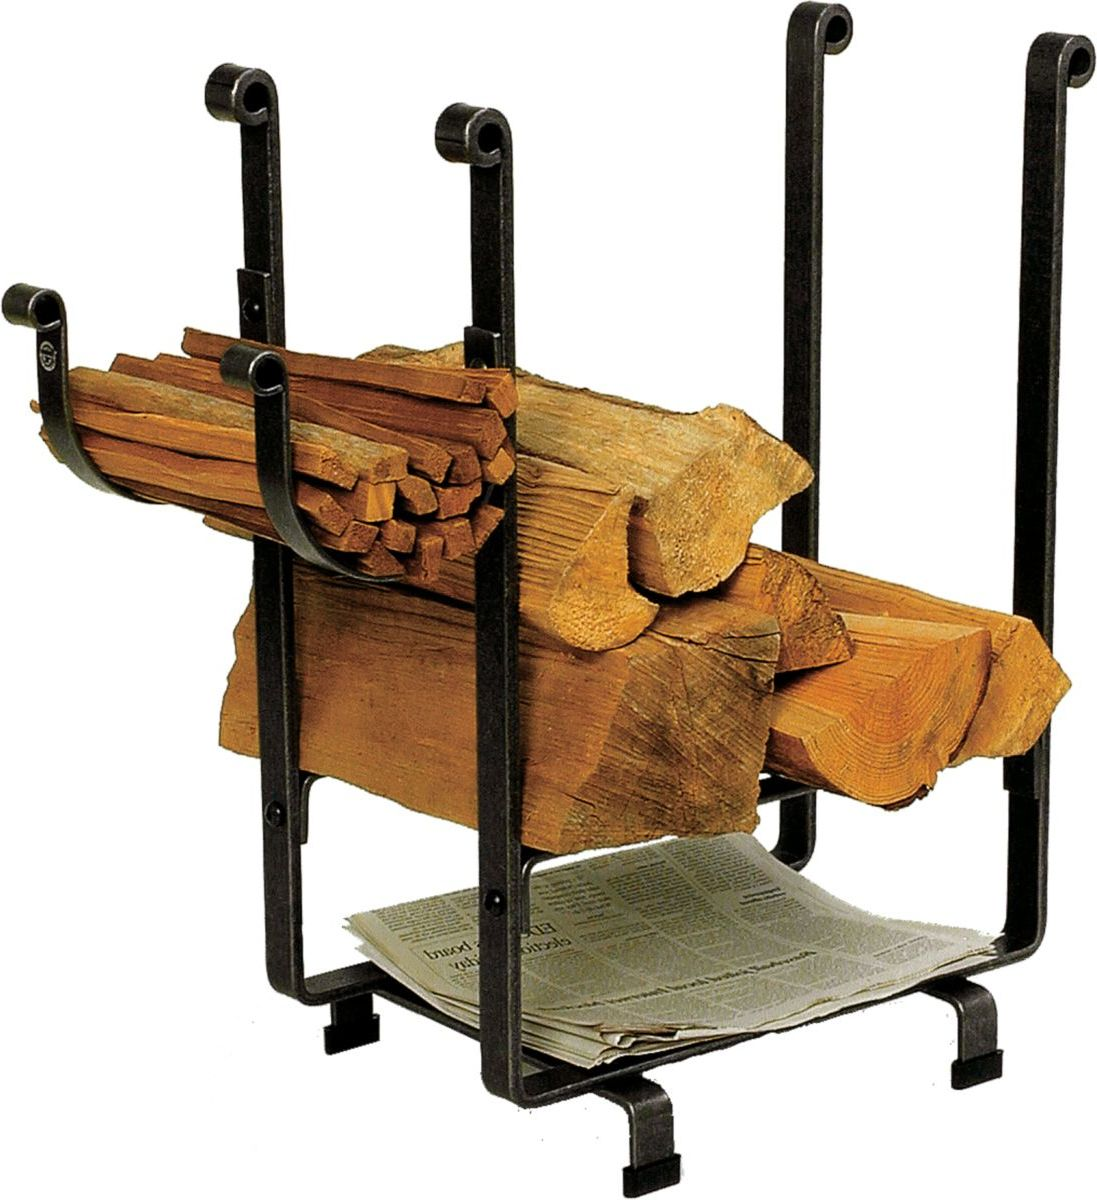 Enclume Hearth Rectangular Log Rack with Newspaper Holder